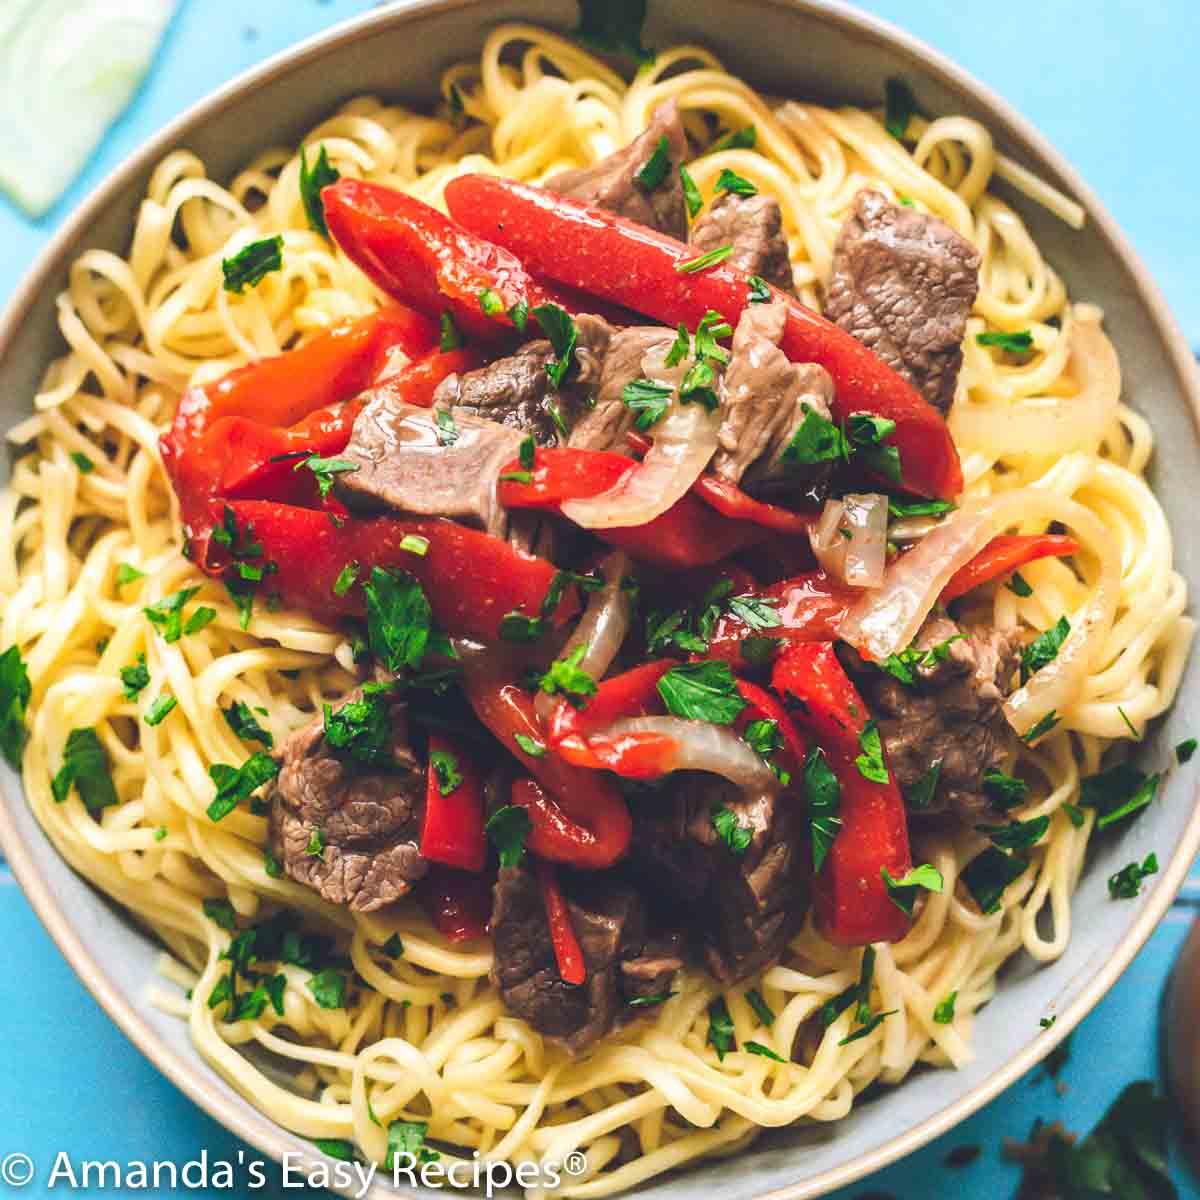 large bowl of pepper steak over cooked noodles